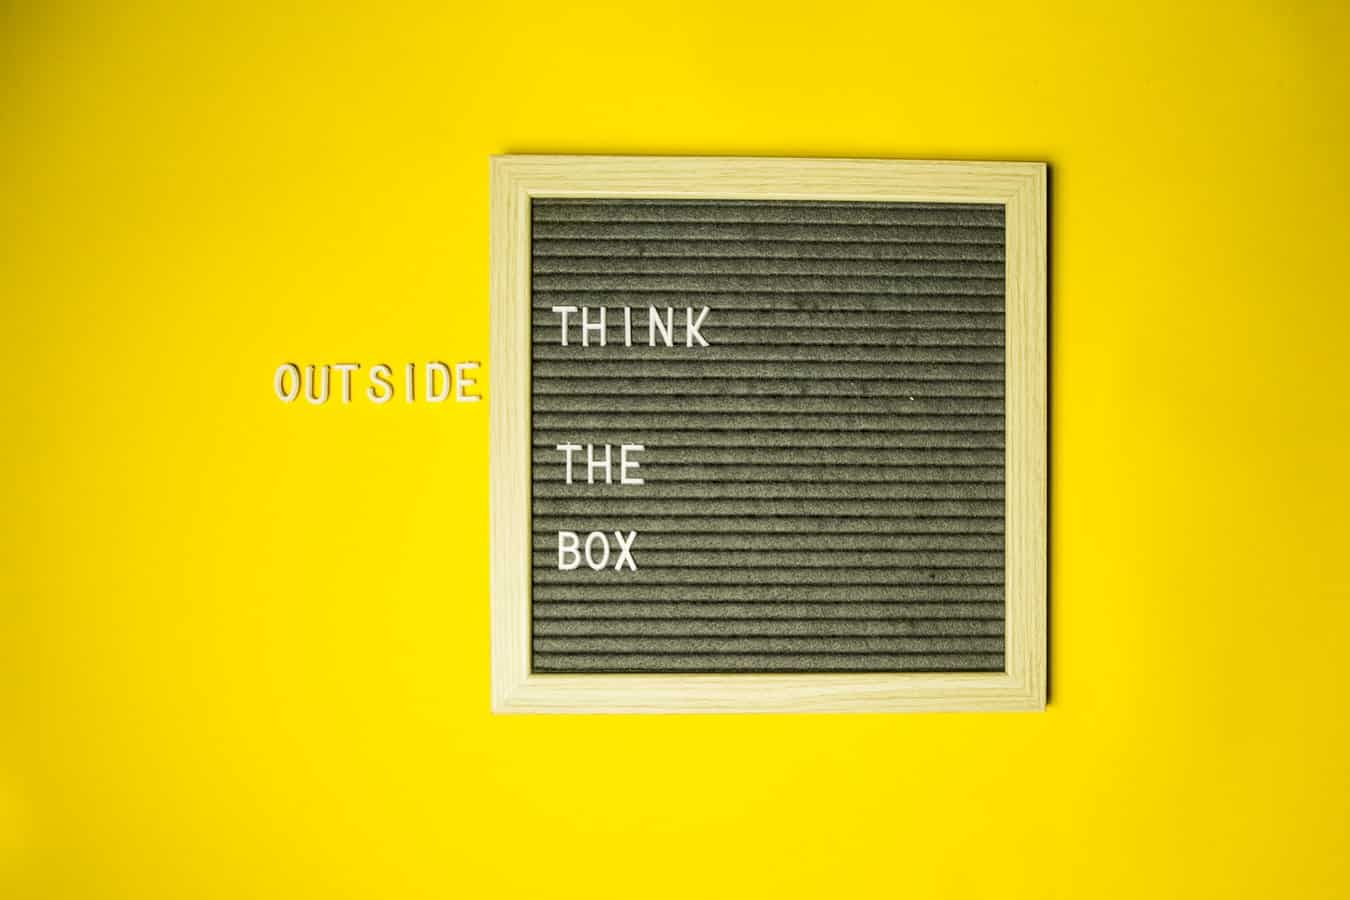 ThinkOutSIdetheBox with a yellow background